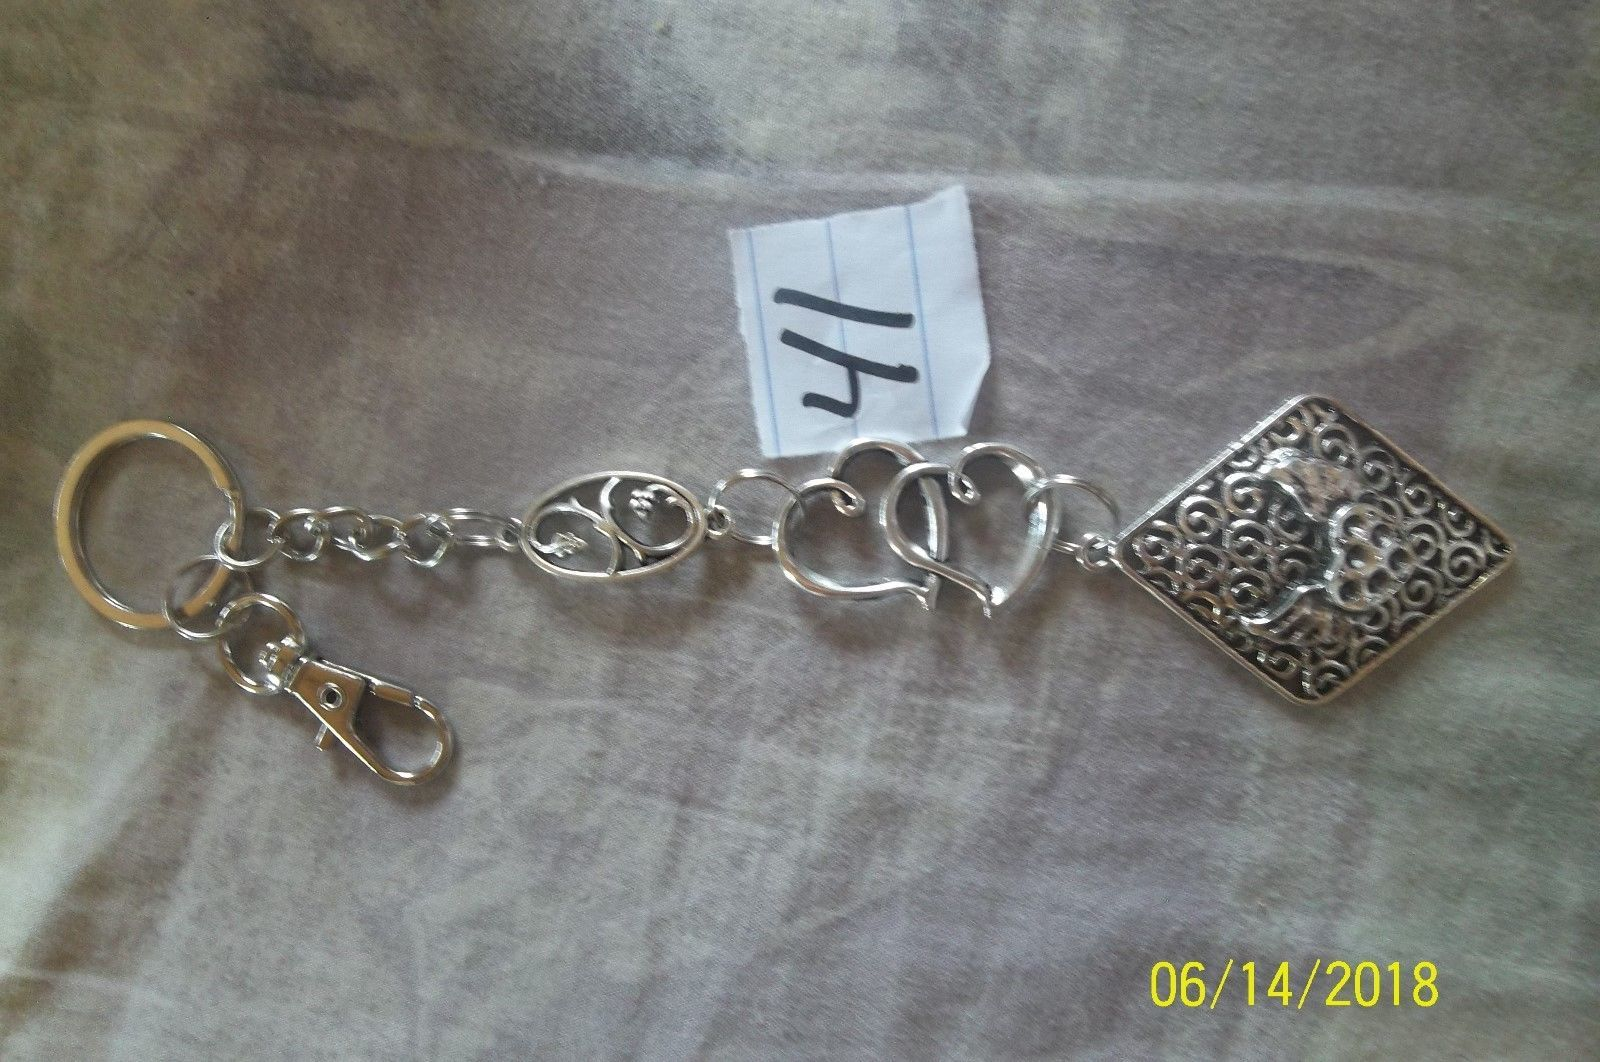 # purse jewelry silver color beauty keychain backpack filigree dangle charm #41